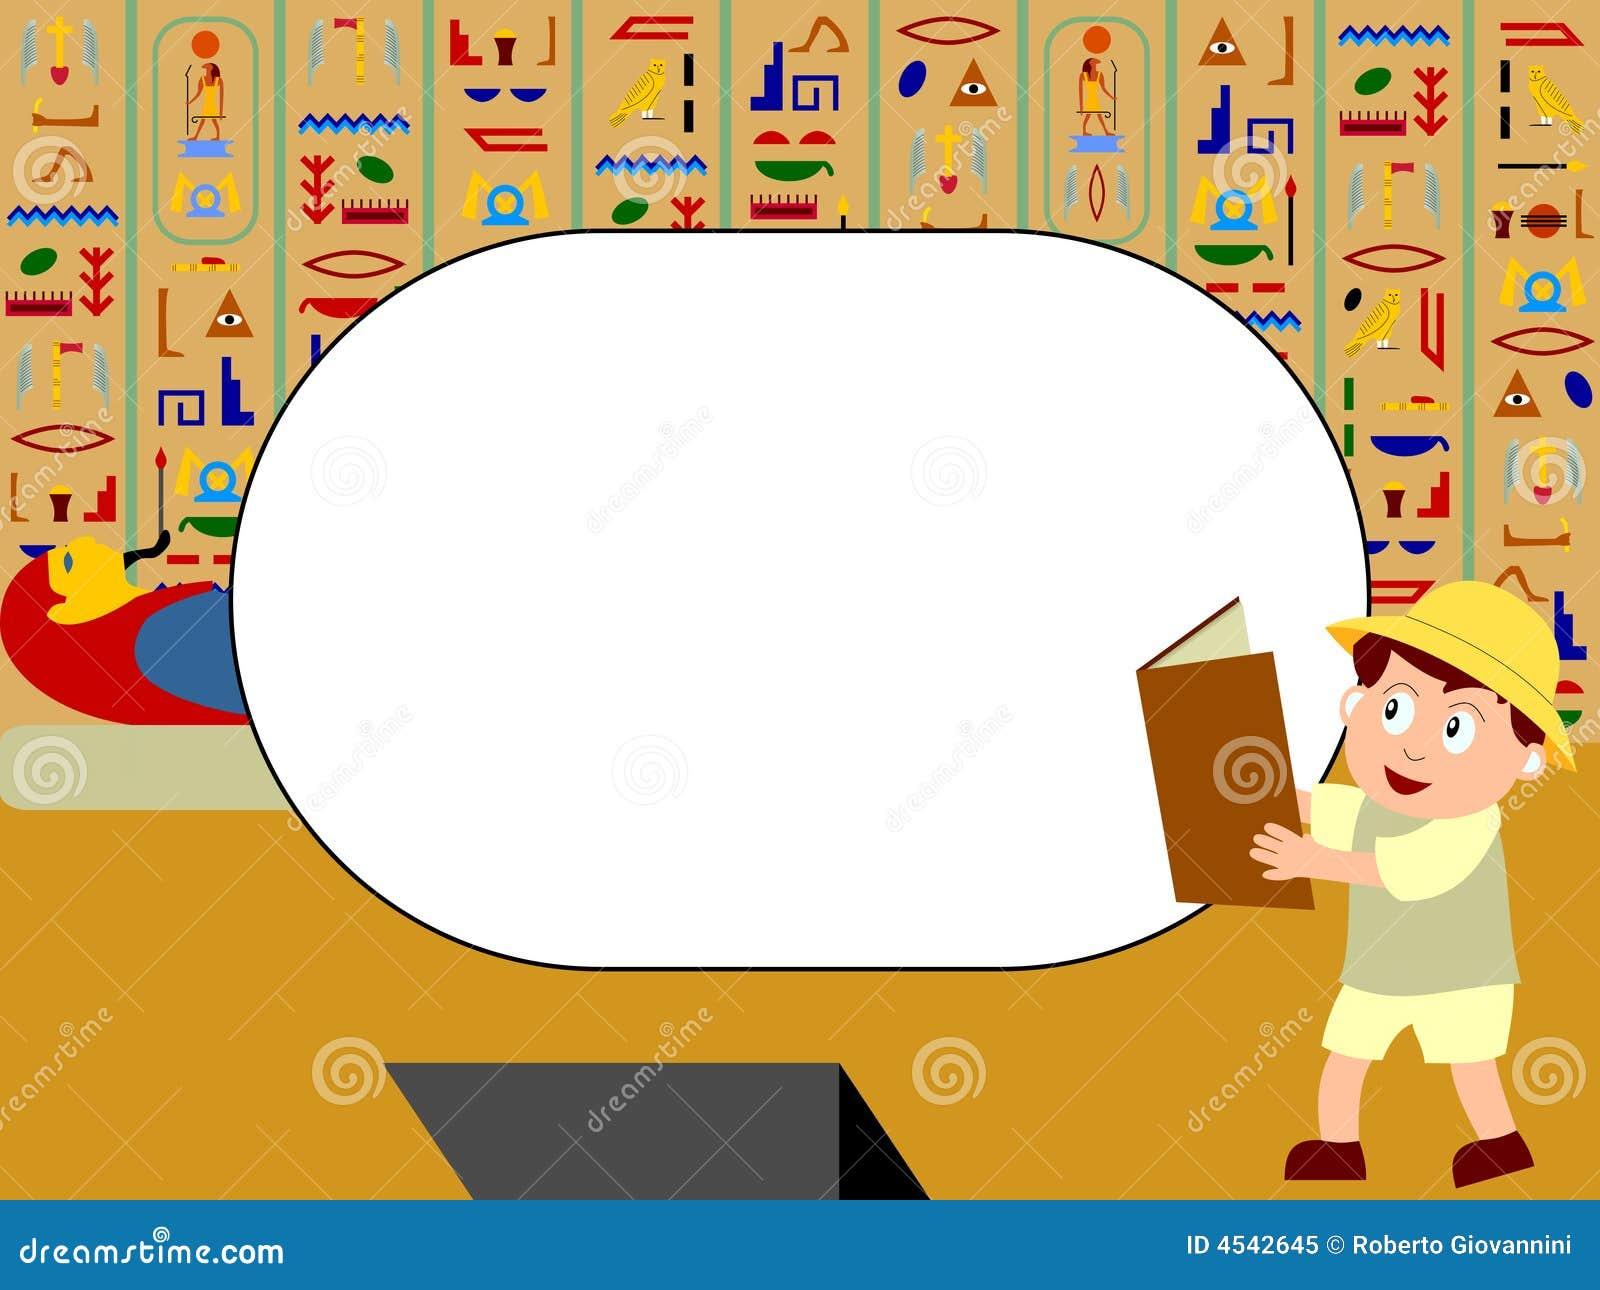 Egypt ramfoto